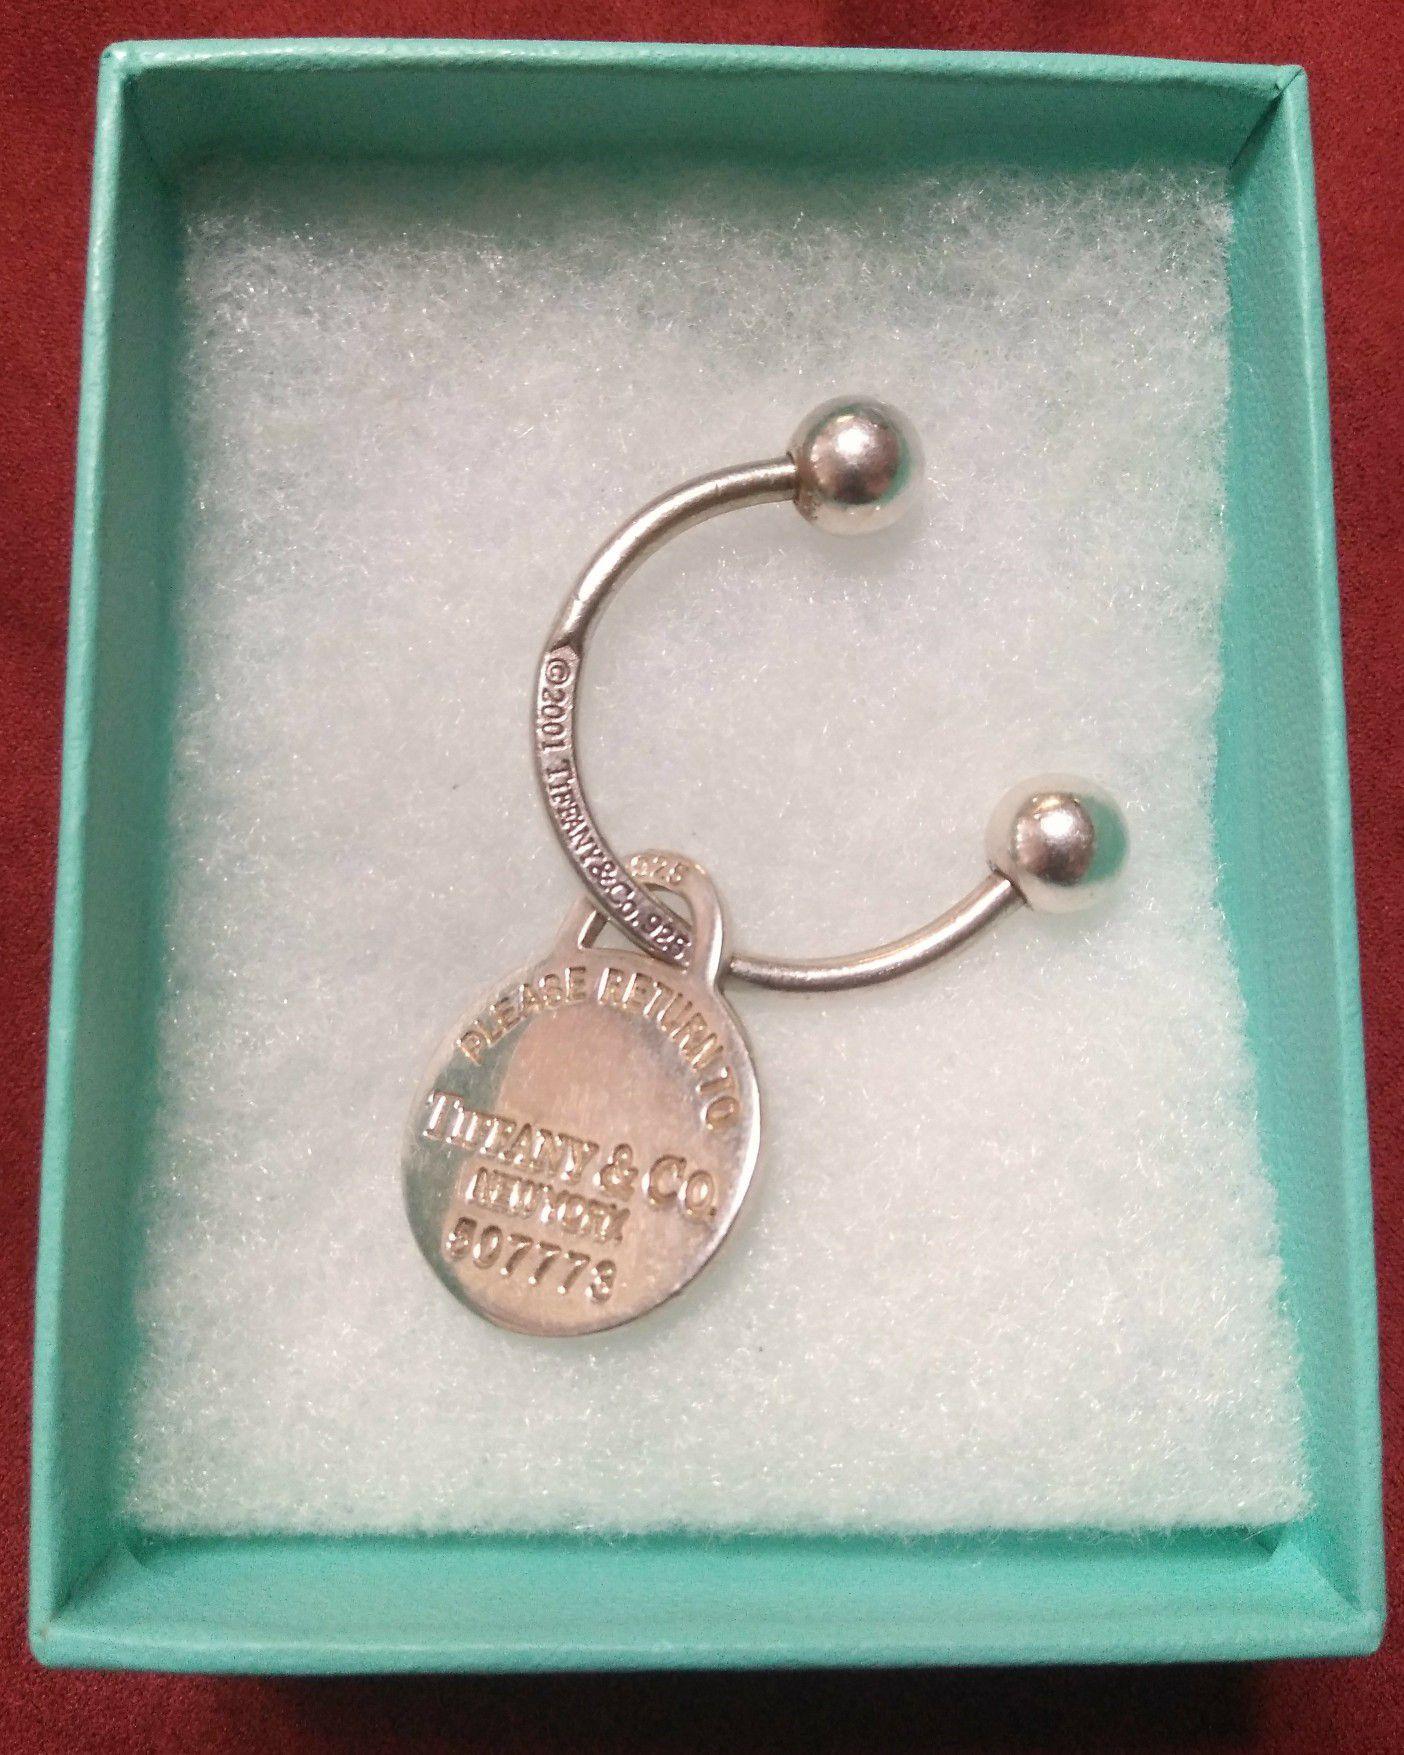 Tiffany co. Key chain Sterling silver 925